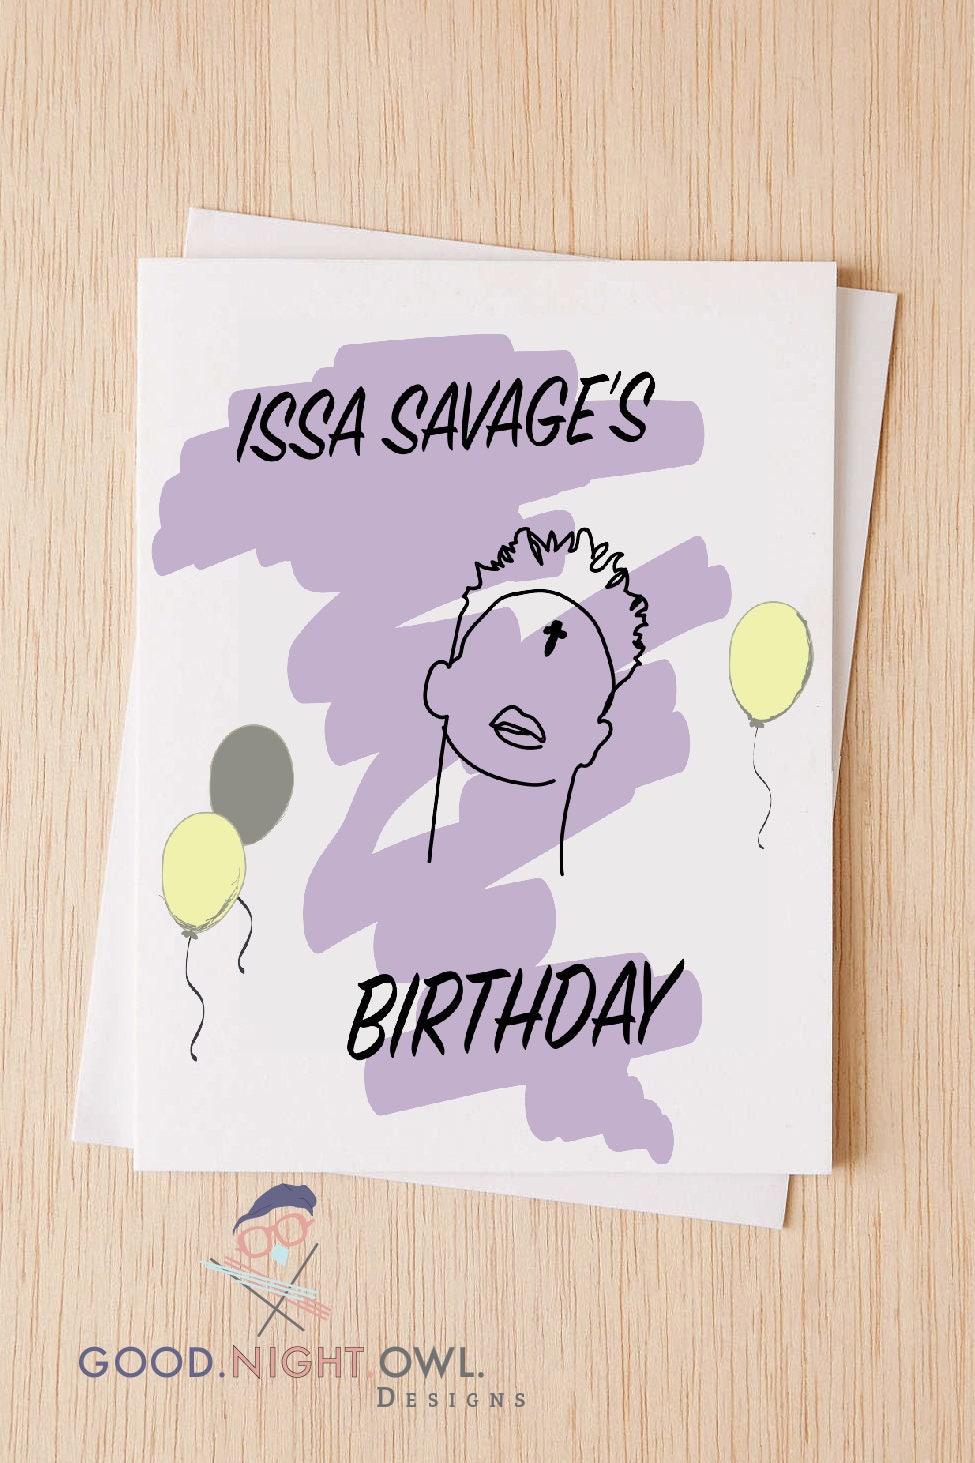 Issa Savages Birthday Birthday Card 21 Savage Birthday Etsy